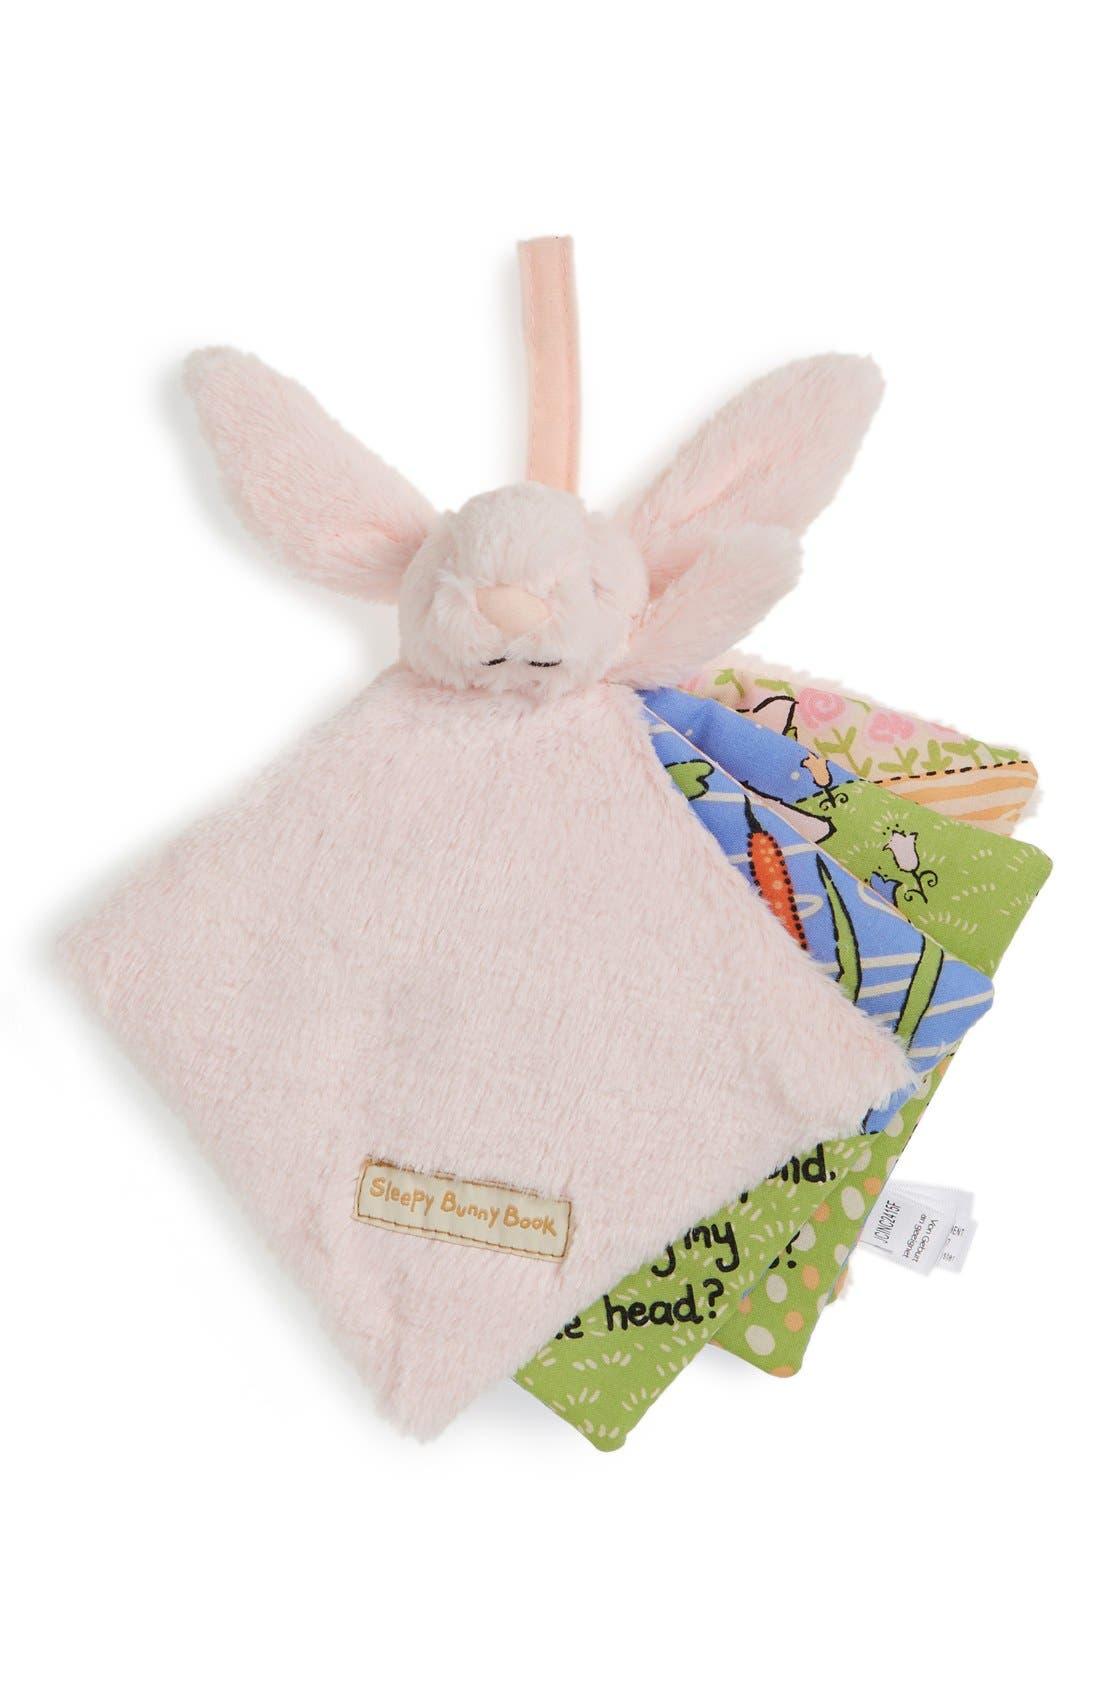 'Sleepy Bunny' Soft Fabric Book